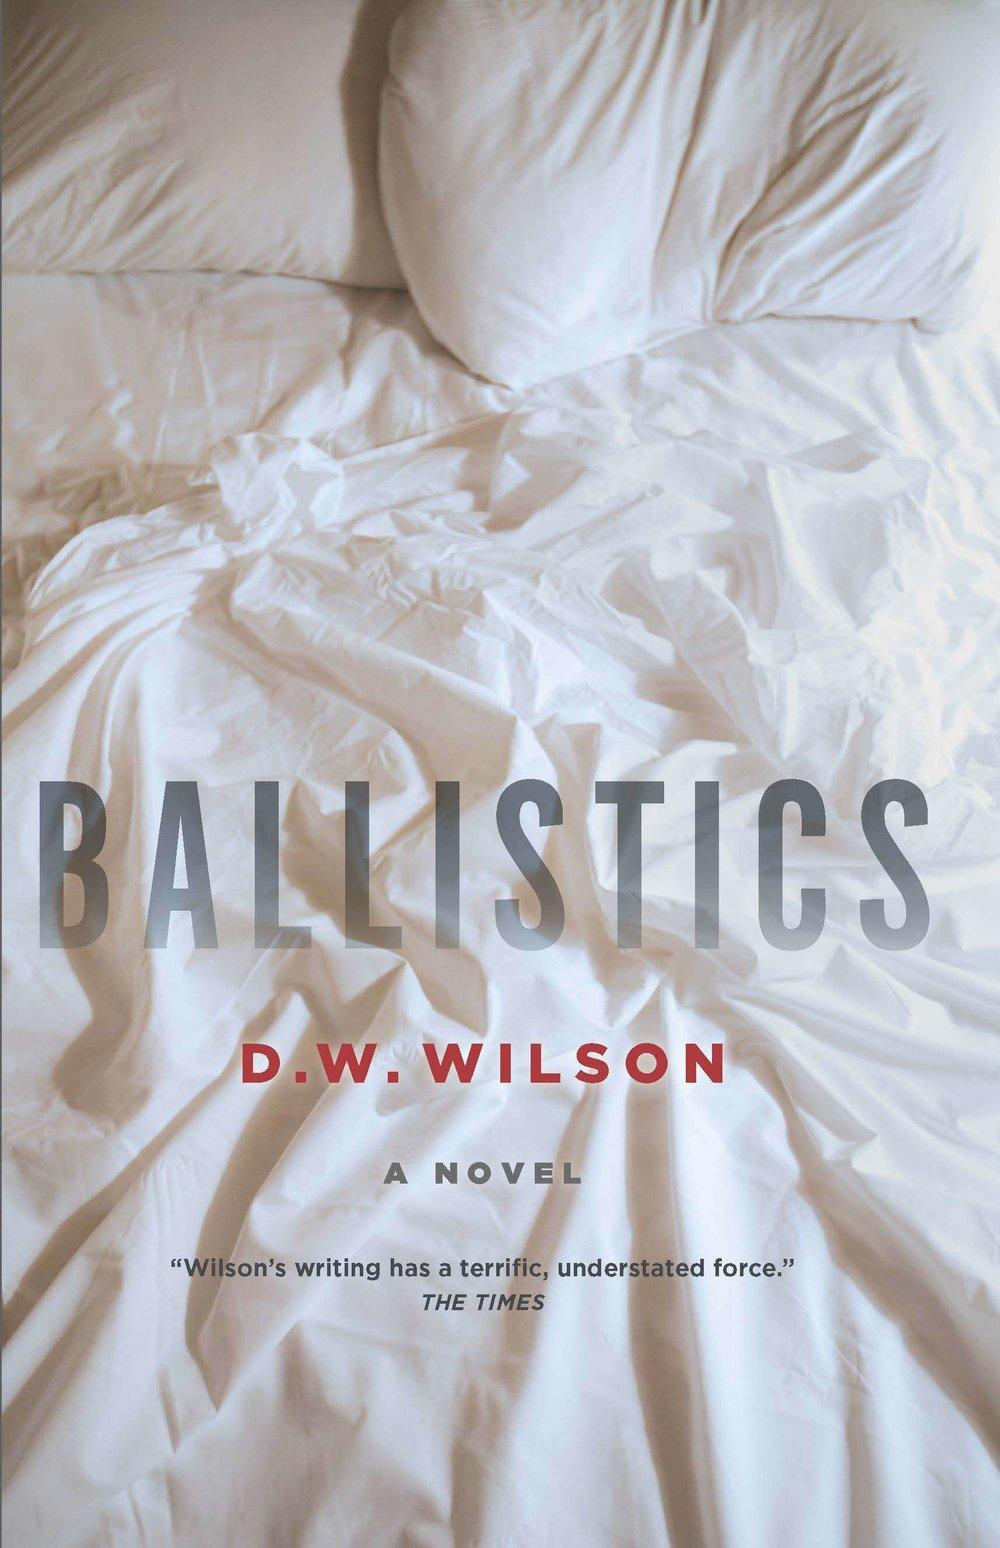 BALLISTICS_Hh Hardcover.jpeg